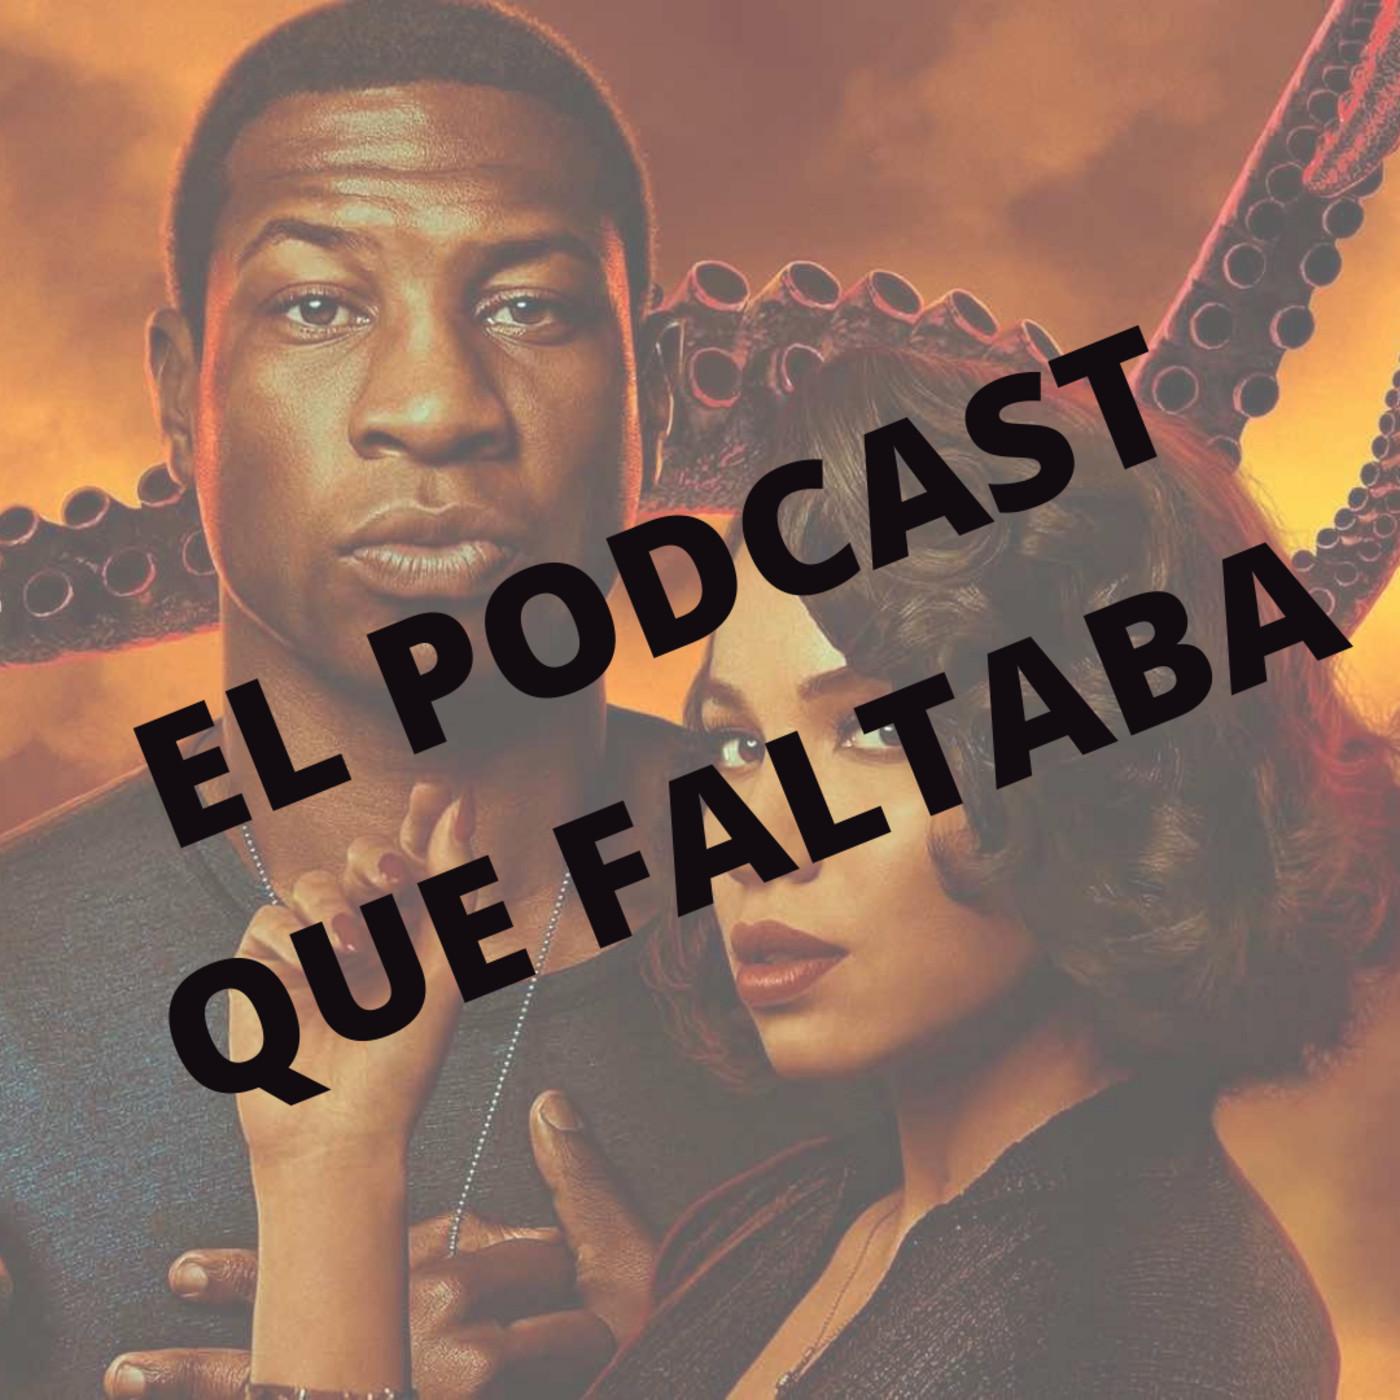 El Podcast que Faltaba sobre Lovecraft Country - Episodio 10: Full Circle (Season Finale)